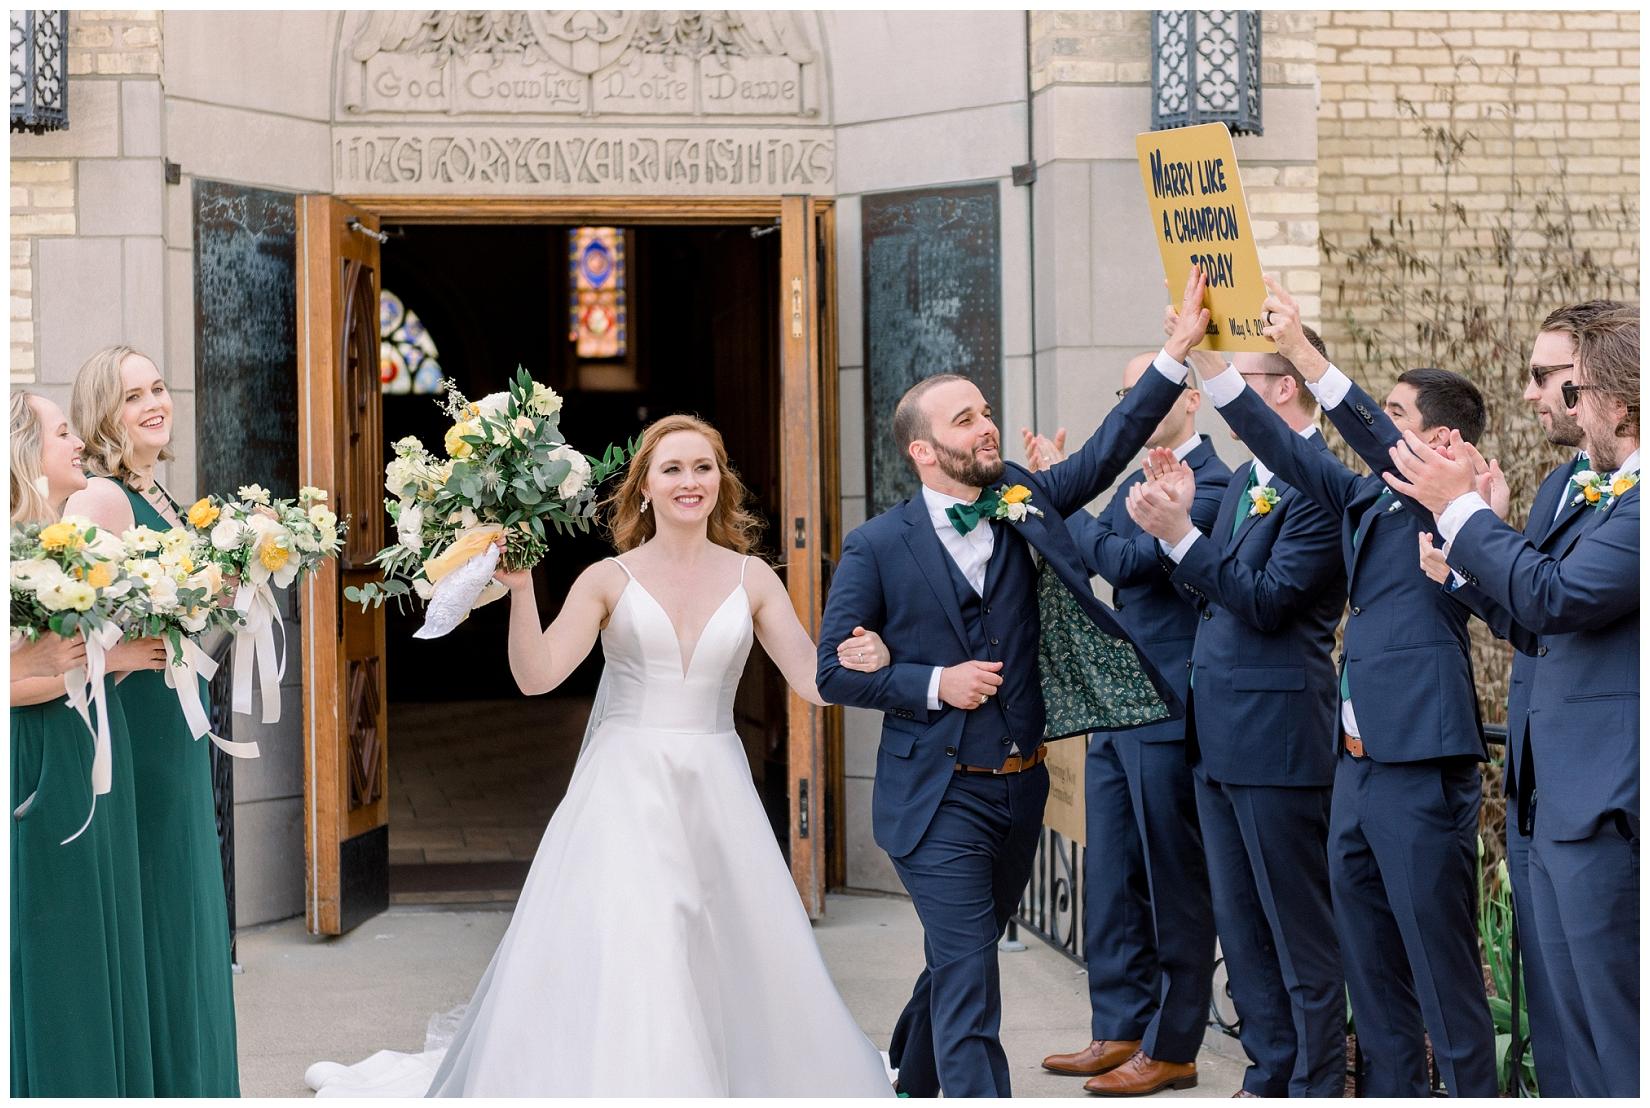 cat-alkire-wedding-photographer-indiana-chicago-indianapolis-fort-wayne_1203.jpg